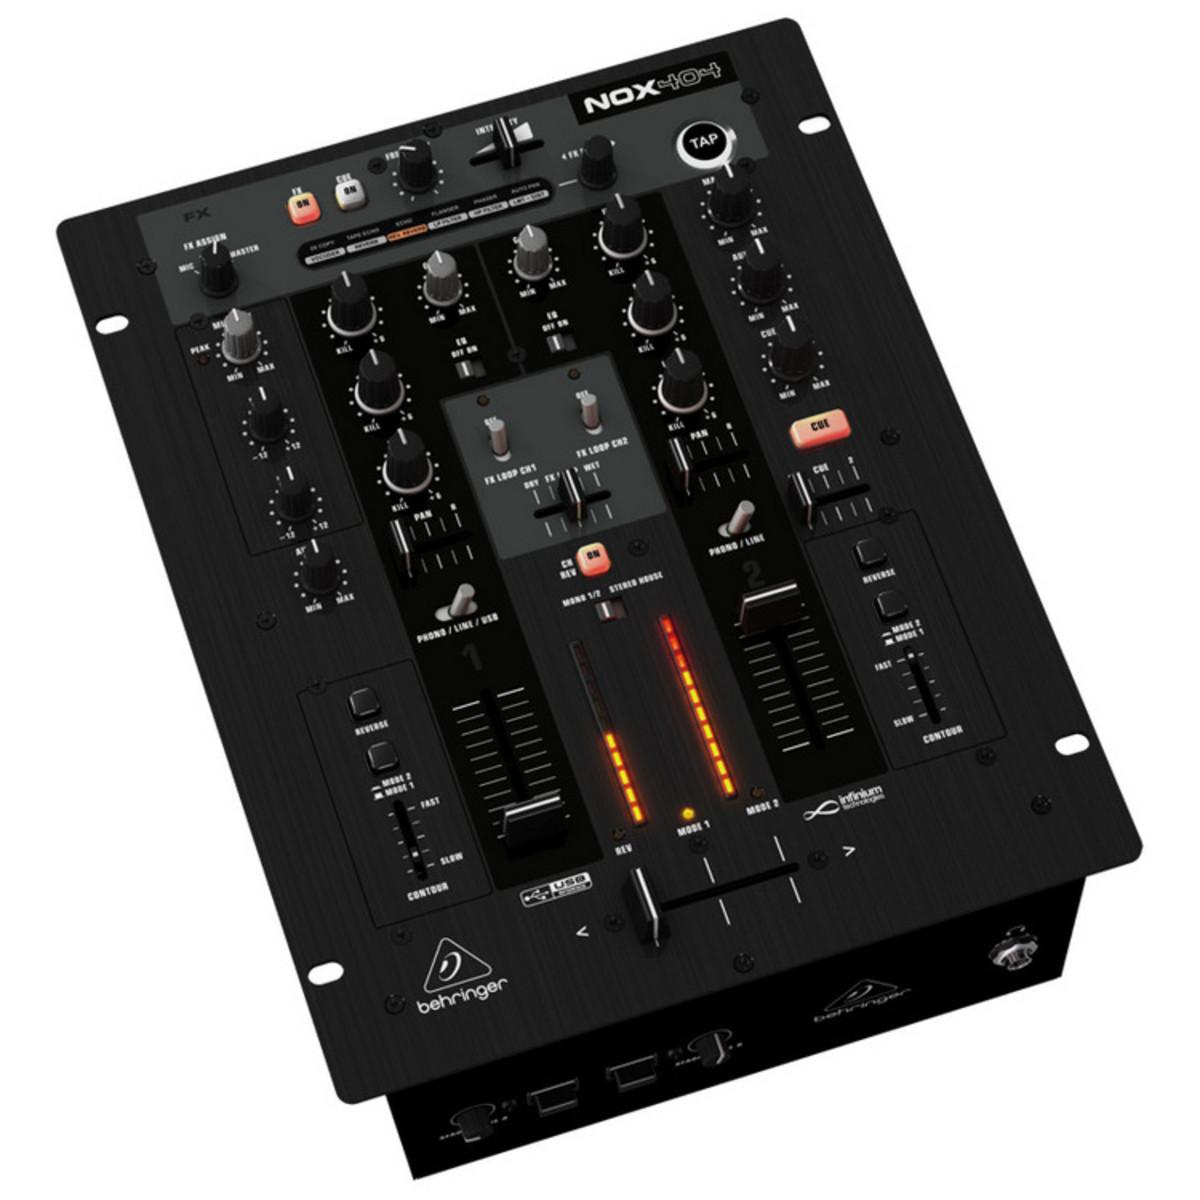 behringer nox404 dj pro mixer nearly new at. Black Bedroom Furniture Sets. Home Design Ideas